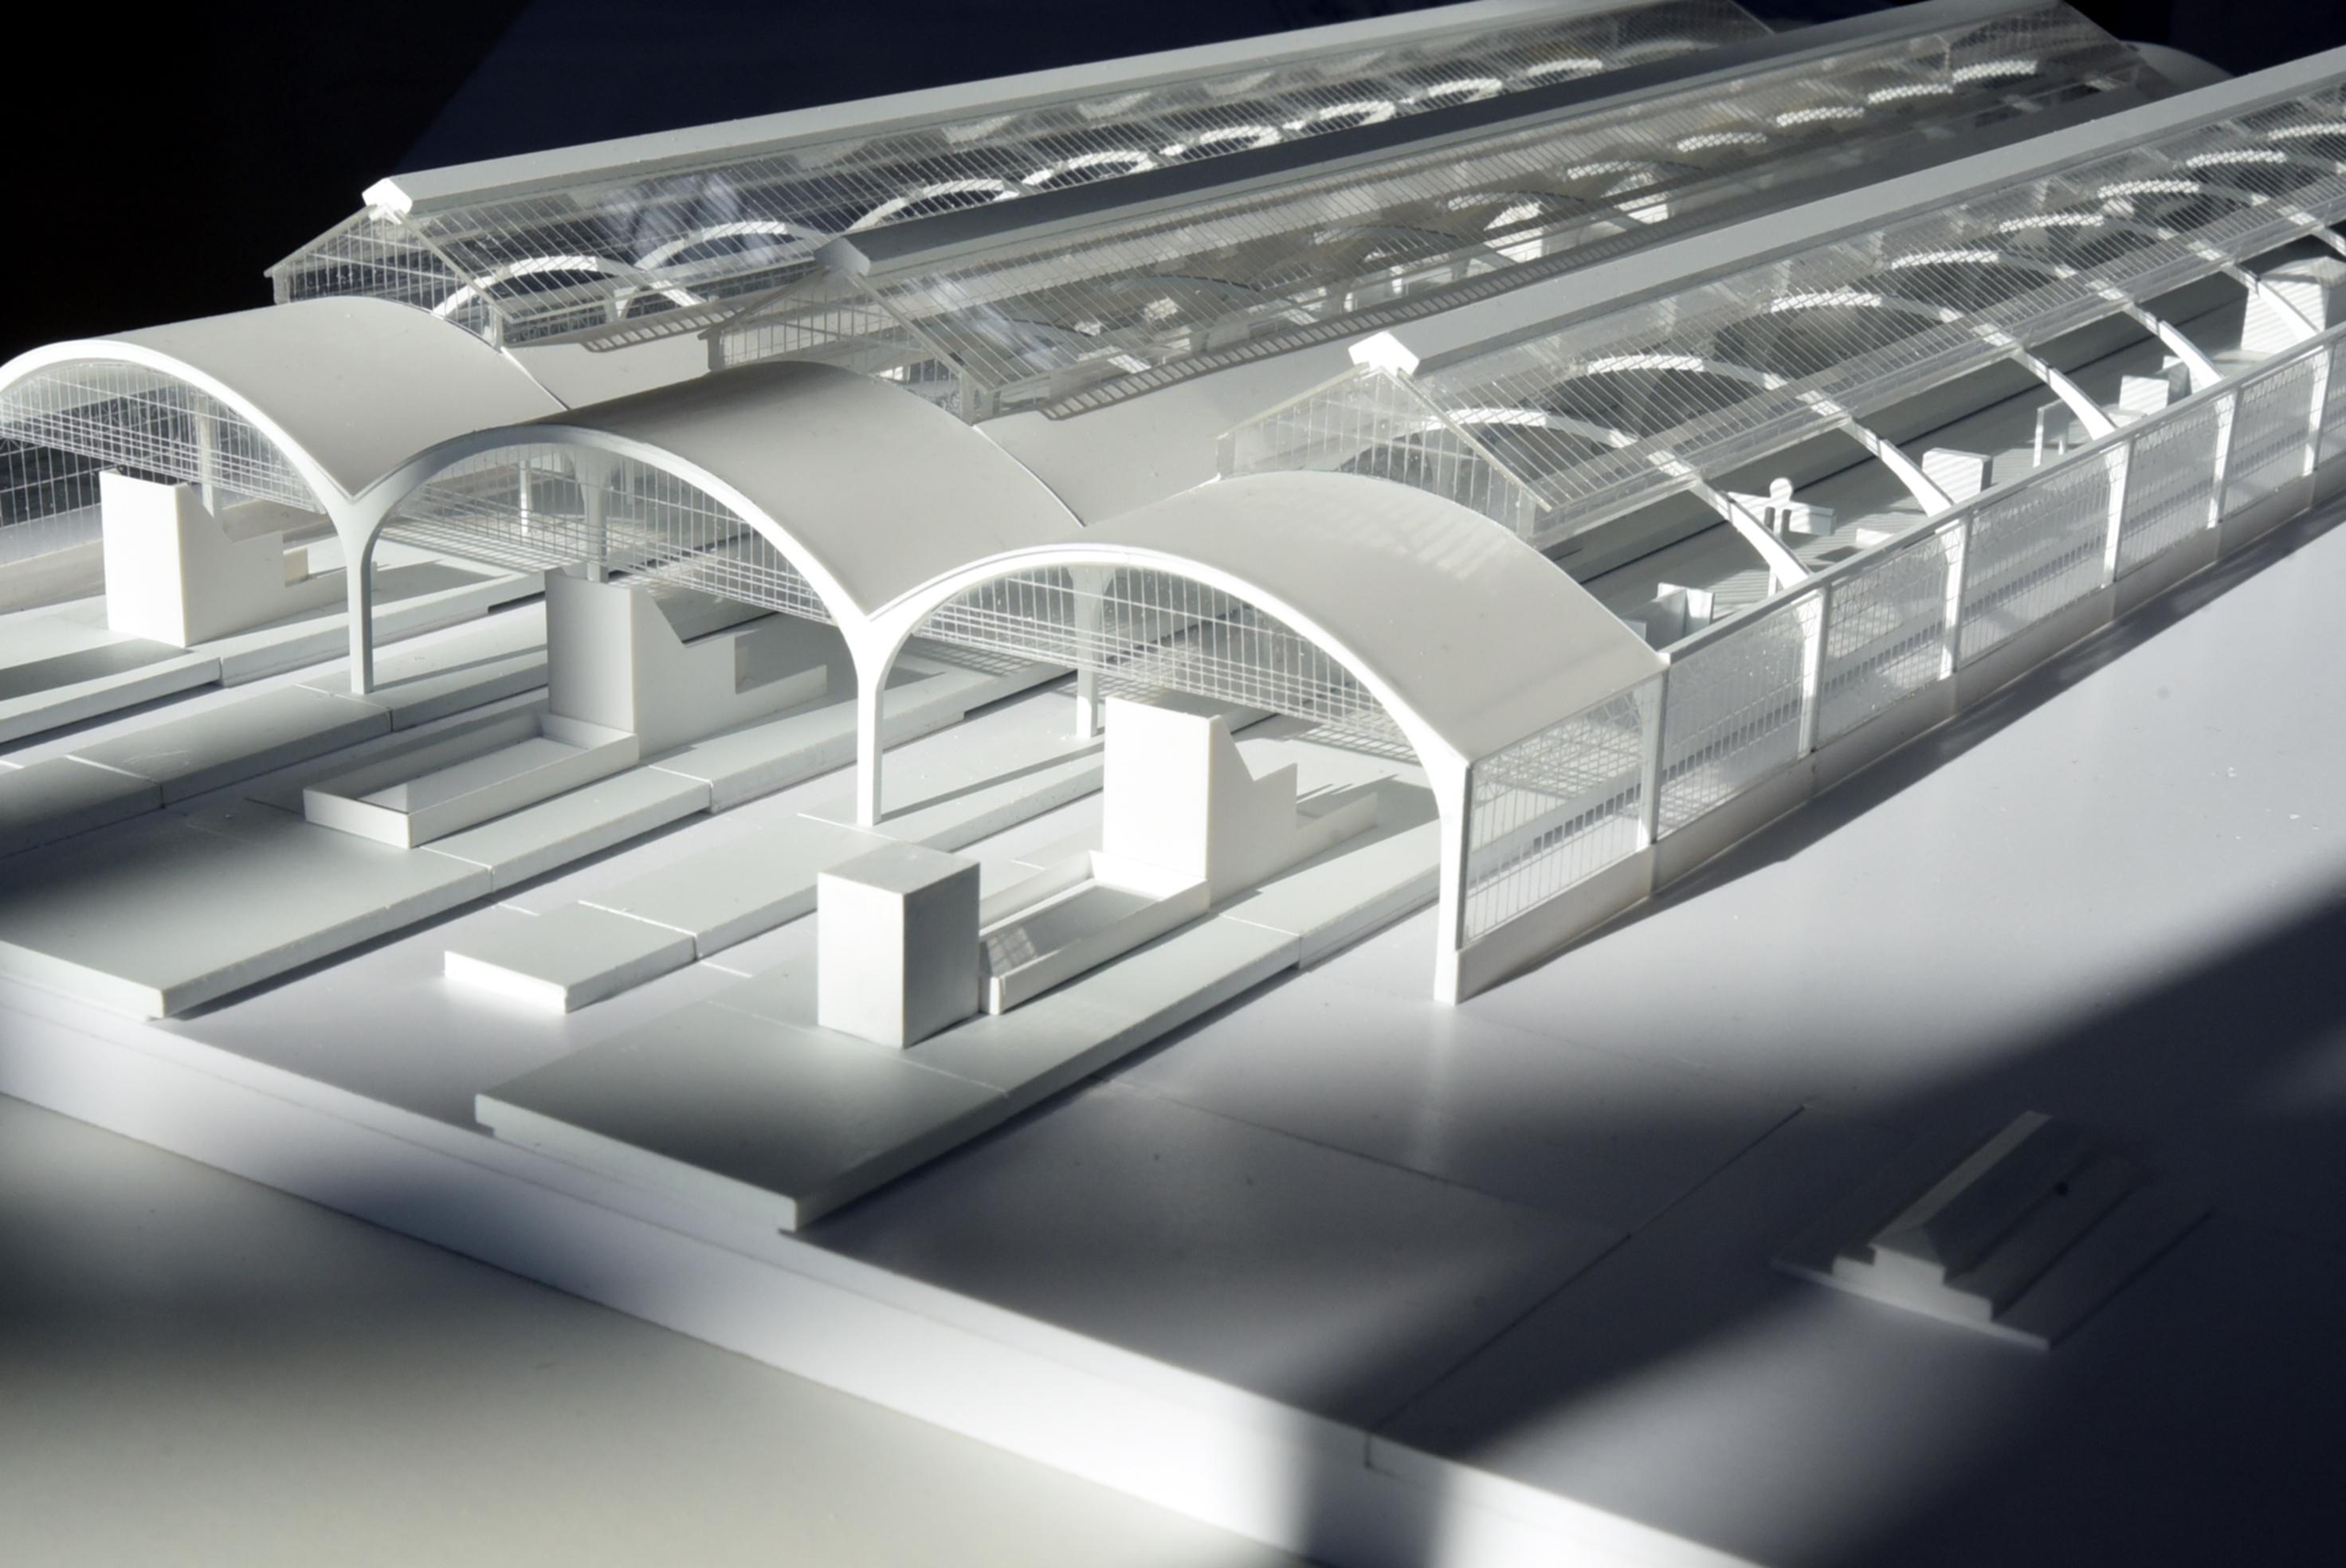 wasser modellbau anleitung